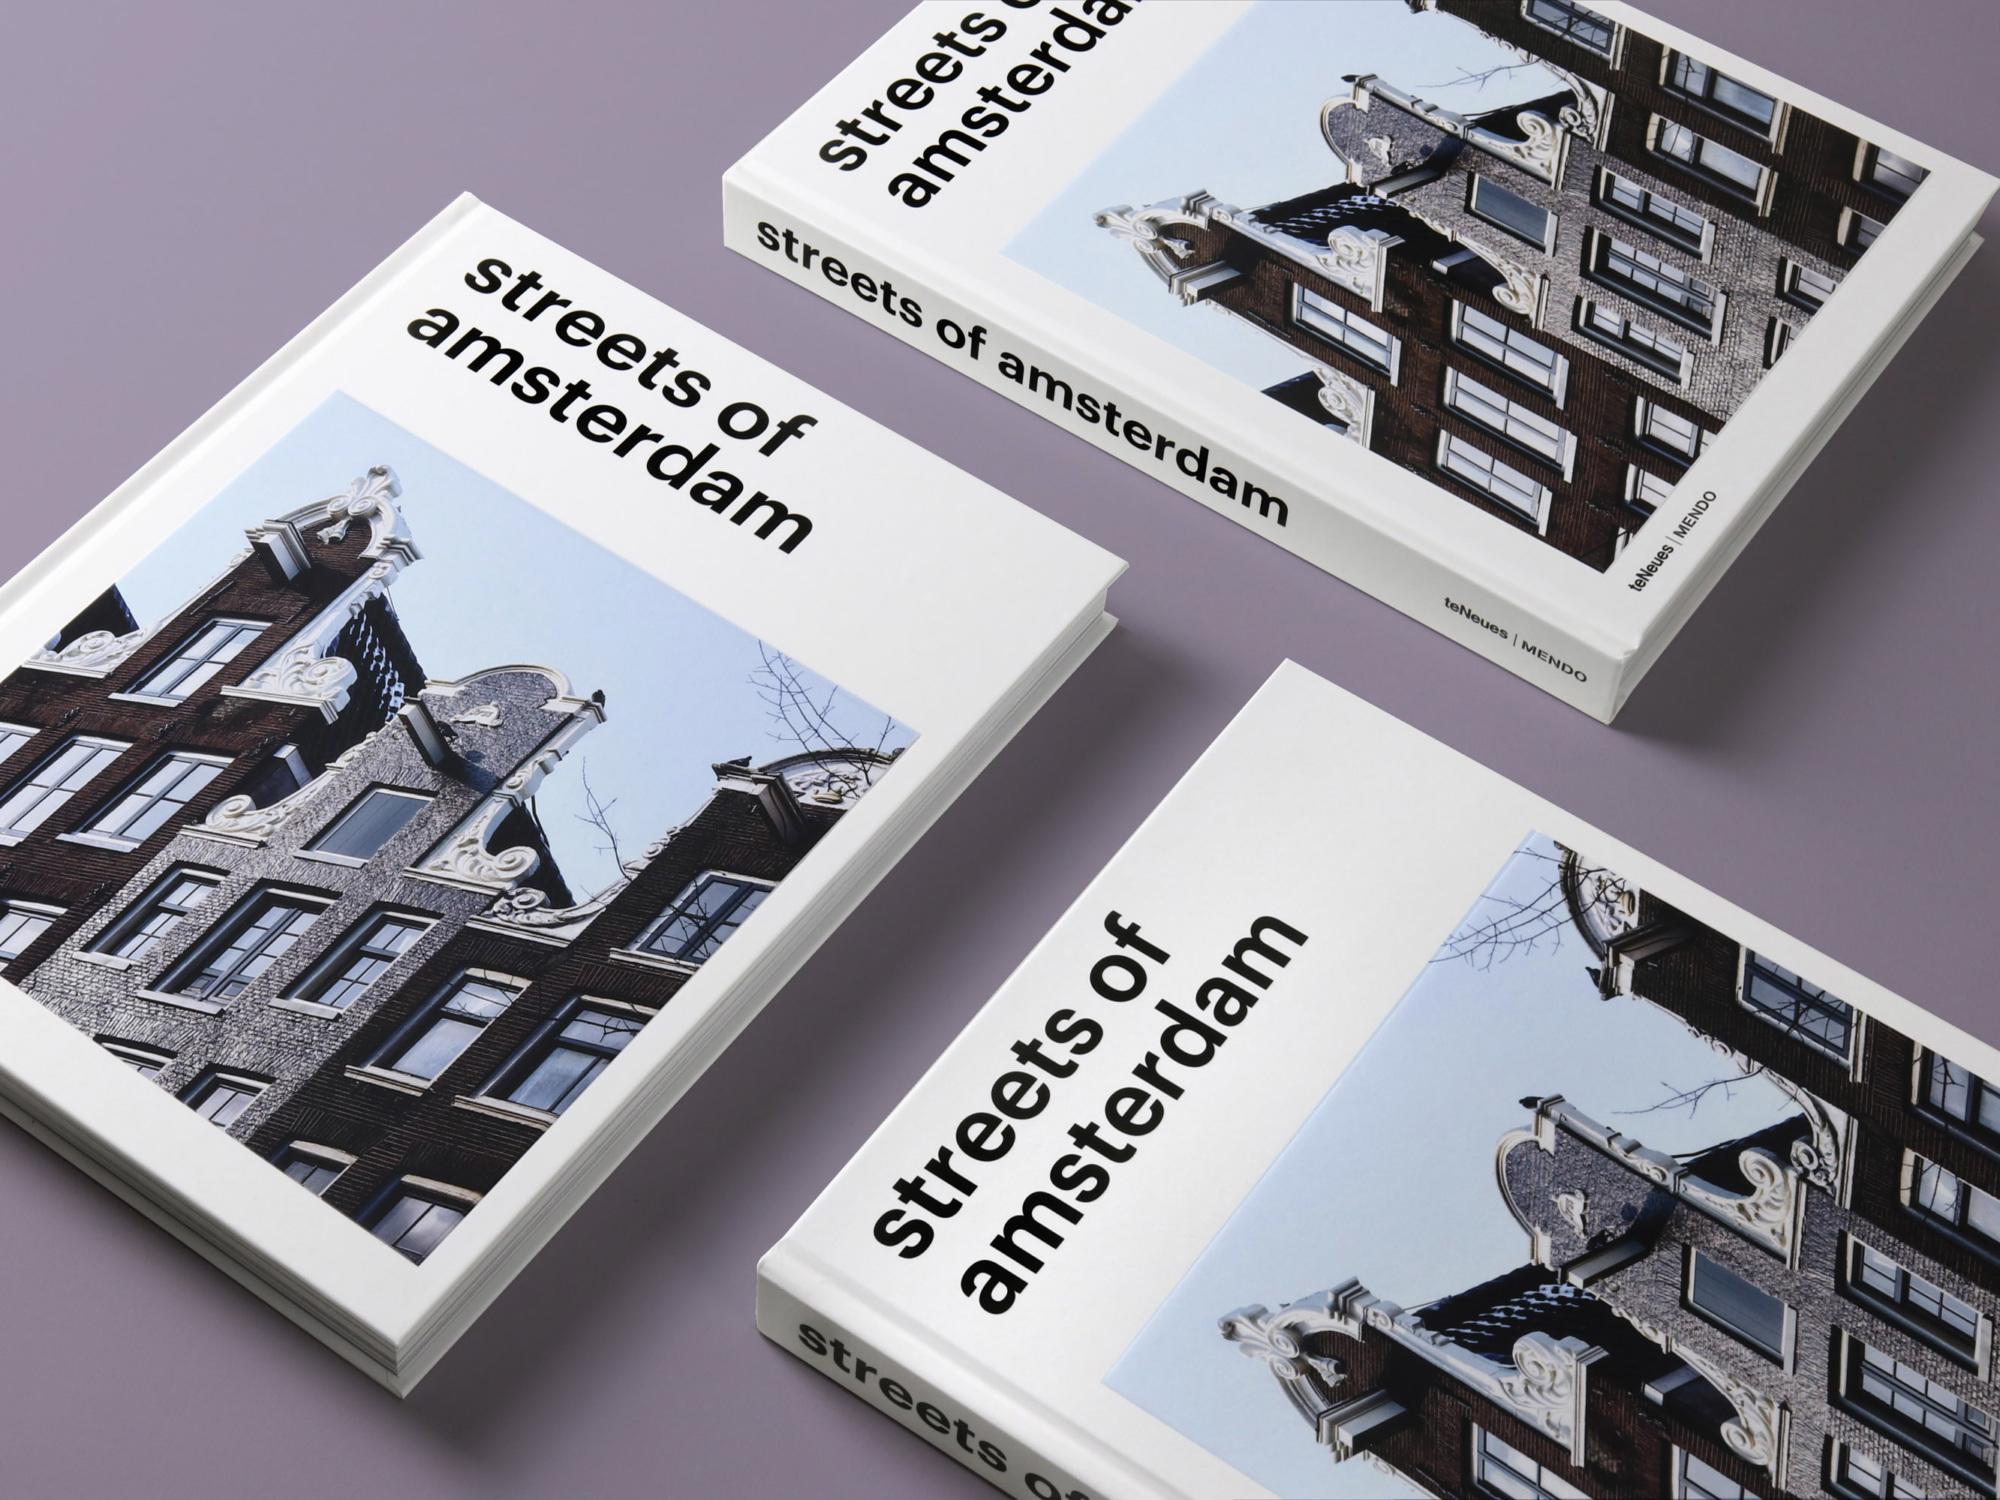 mendo-book-streets-of-amsterdam-studio-23-2000x1500-c-default (2).jpg